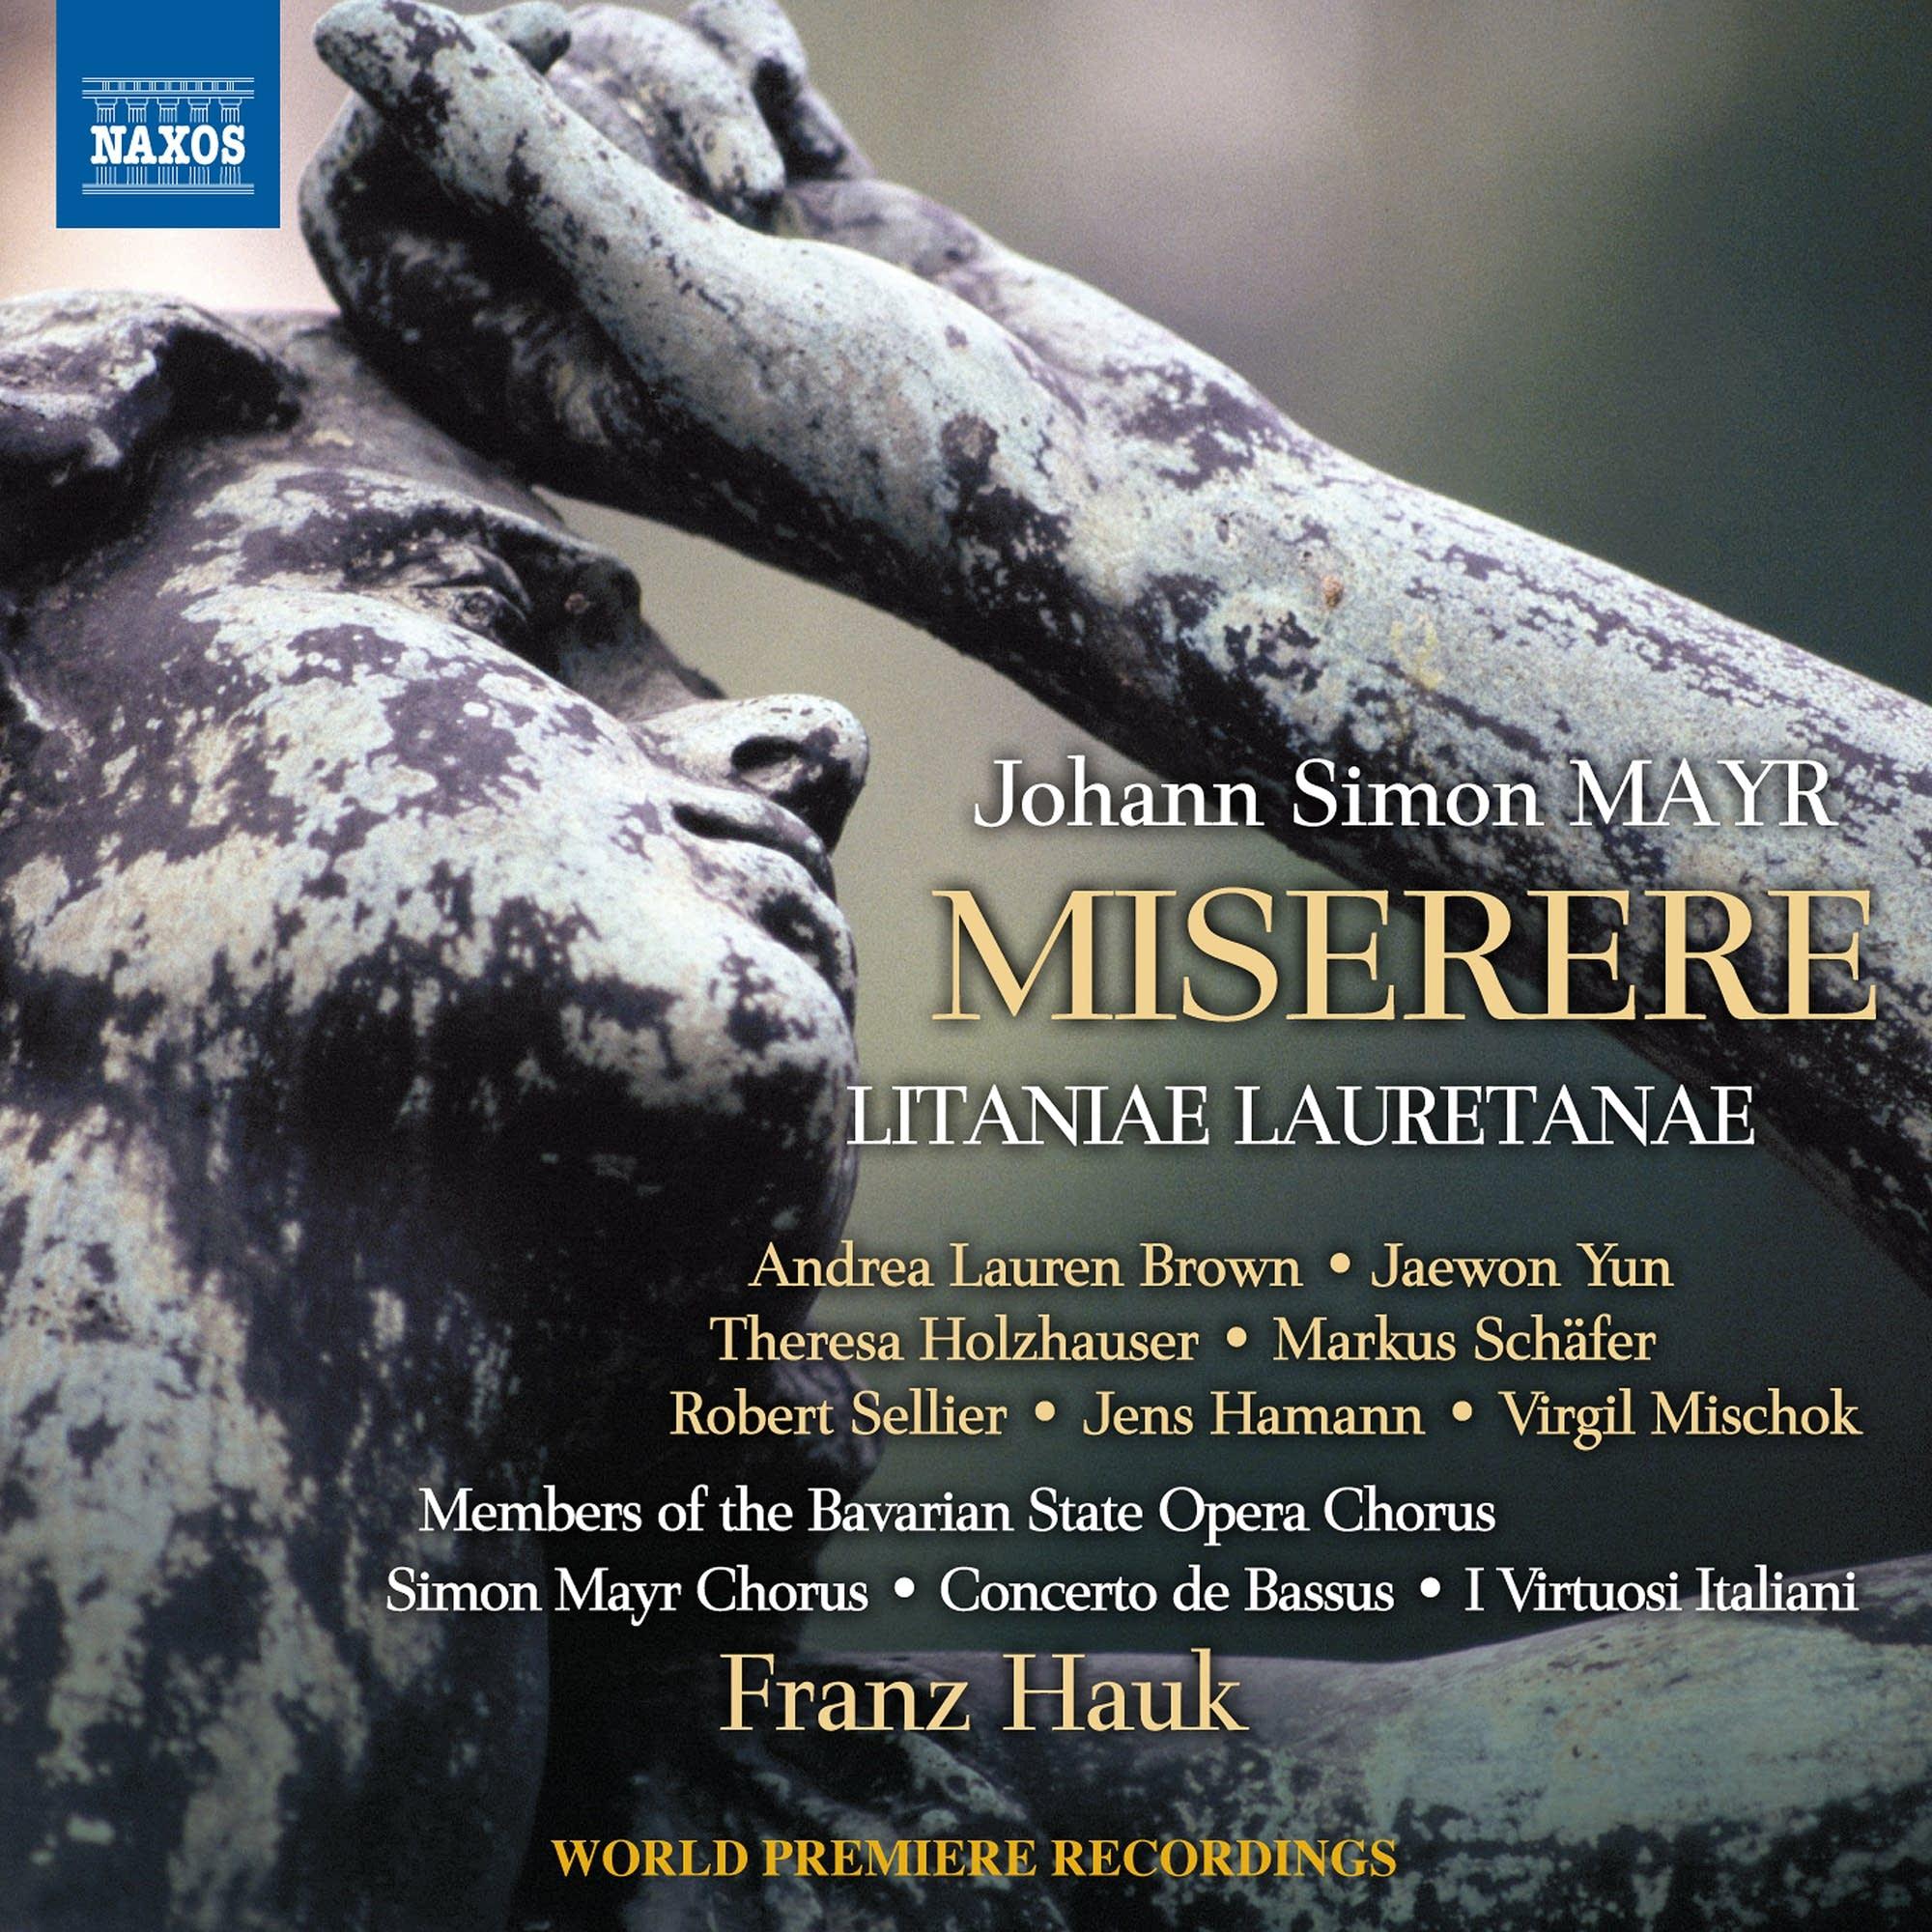 Johann Simon Mayr - Miserere in G minor